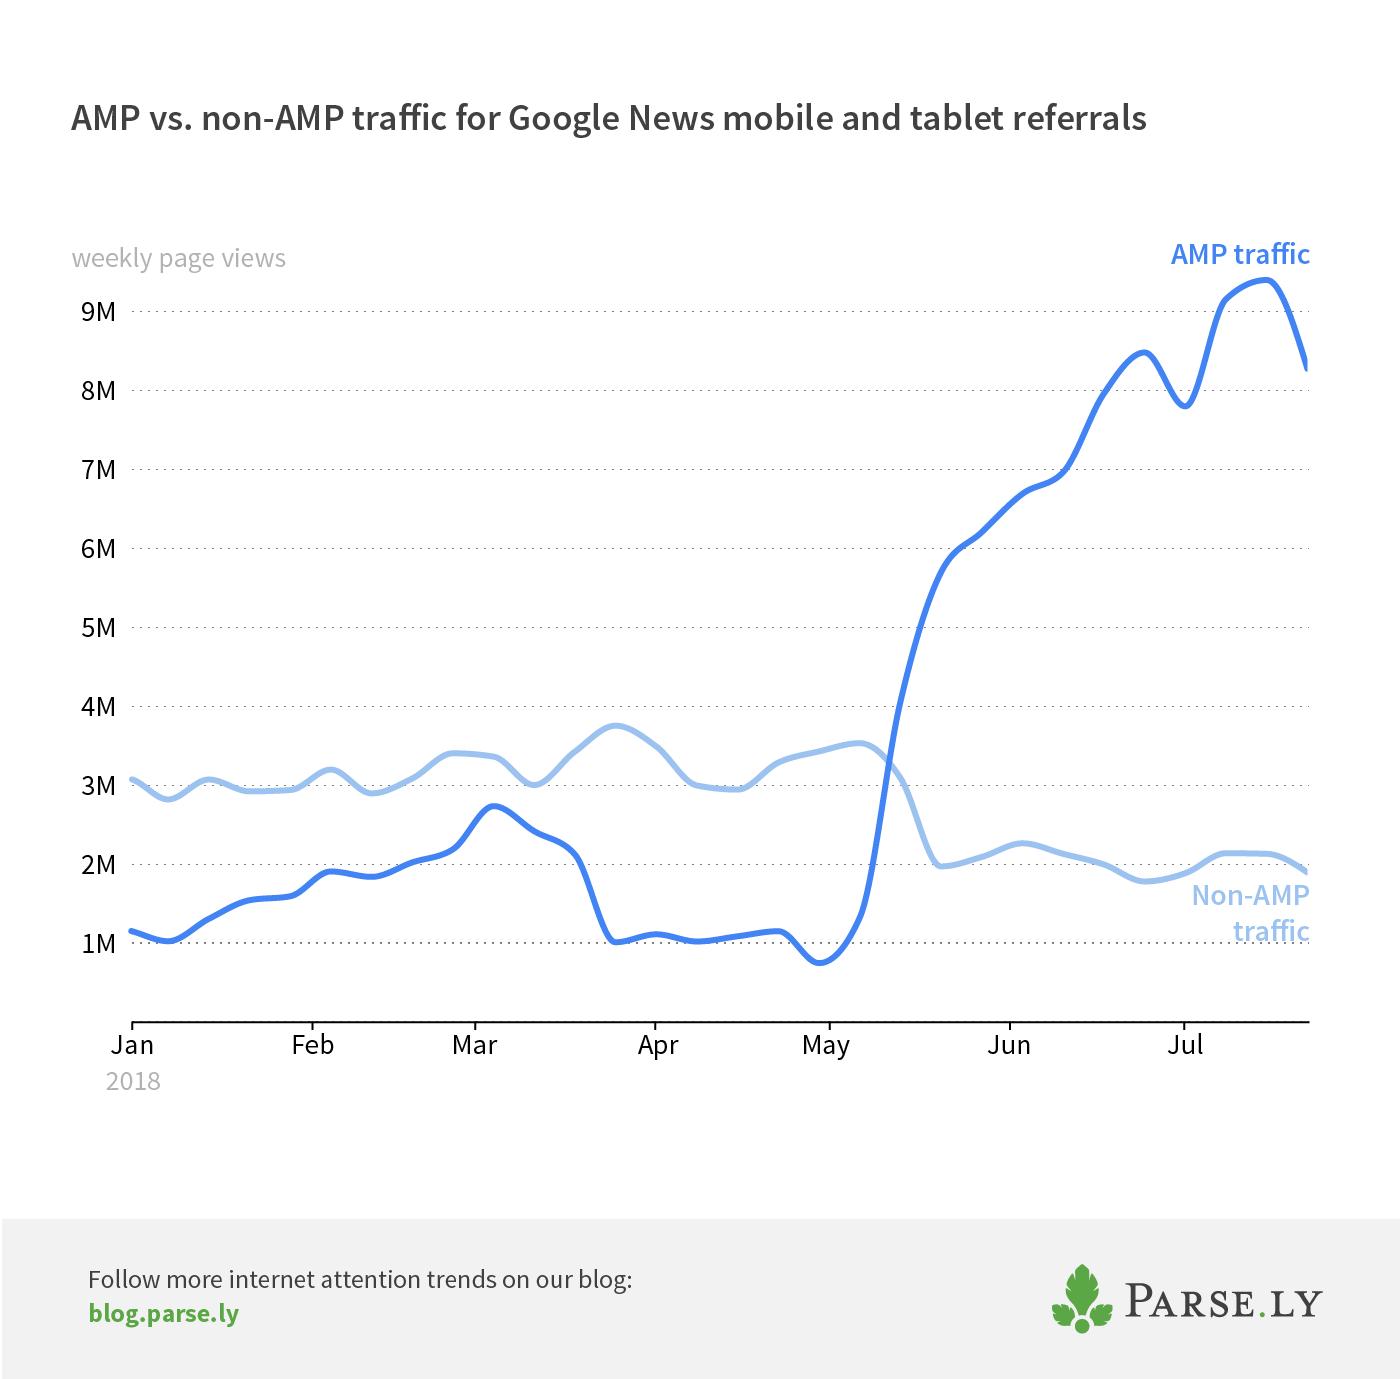 Google News AMP vs. non-AMP traffic